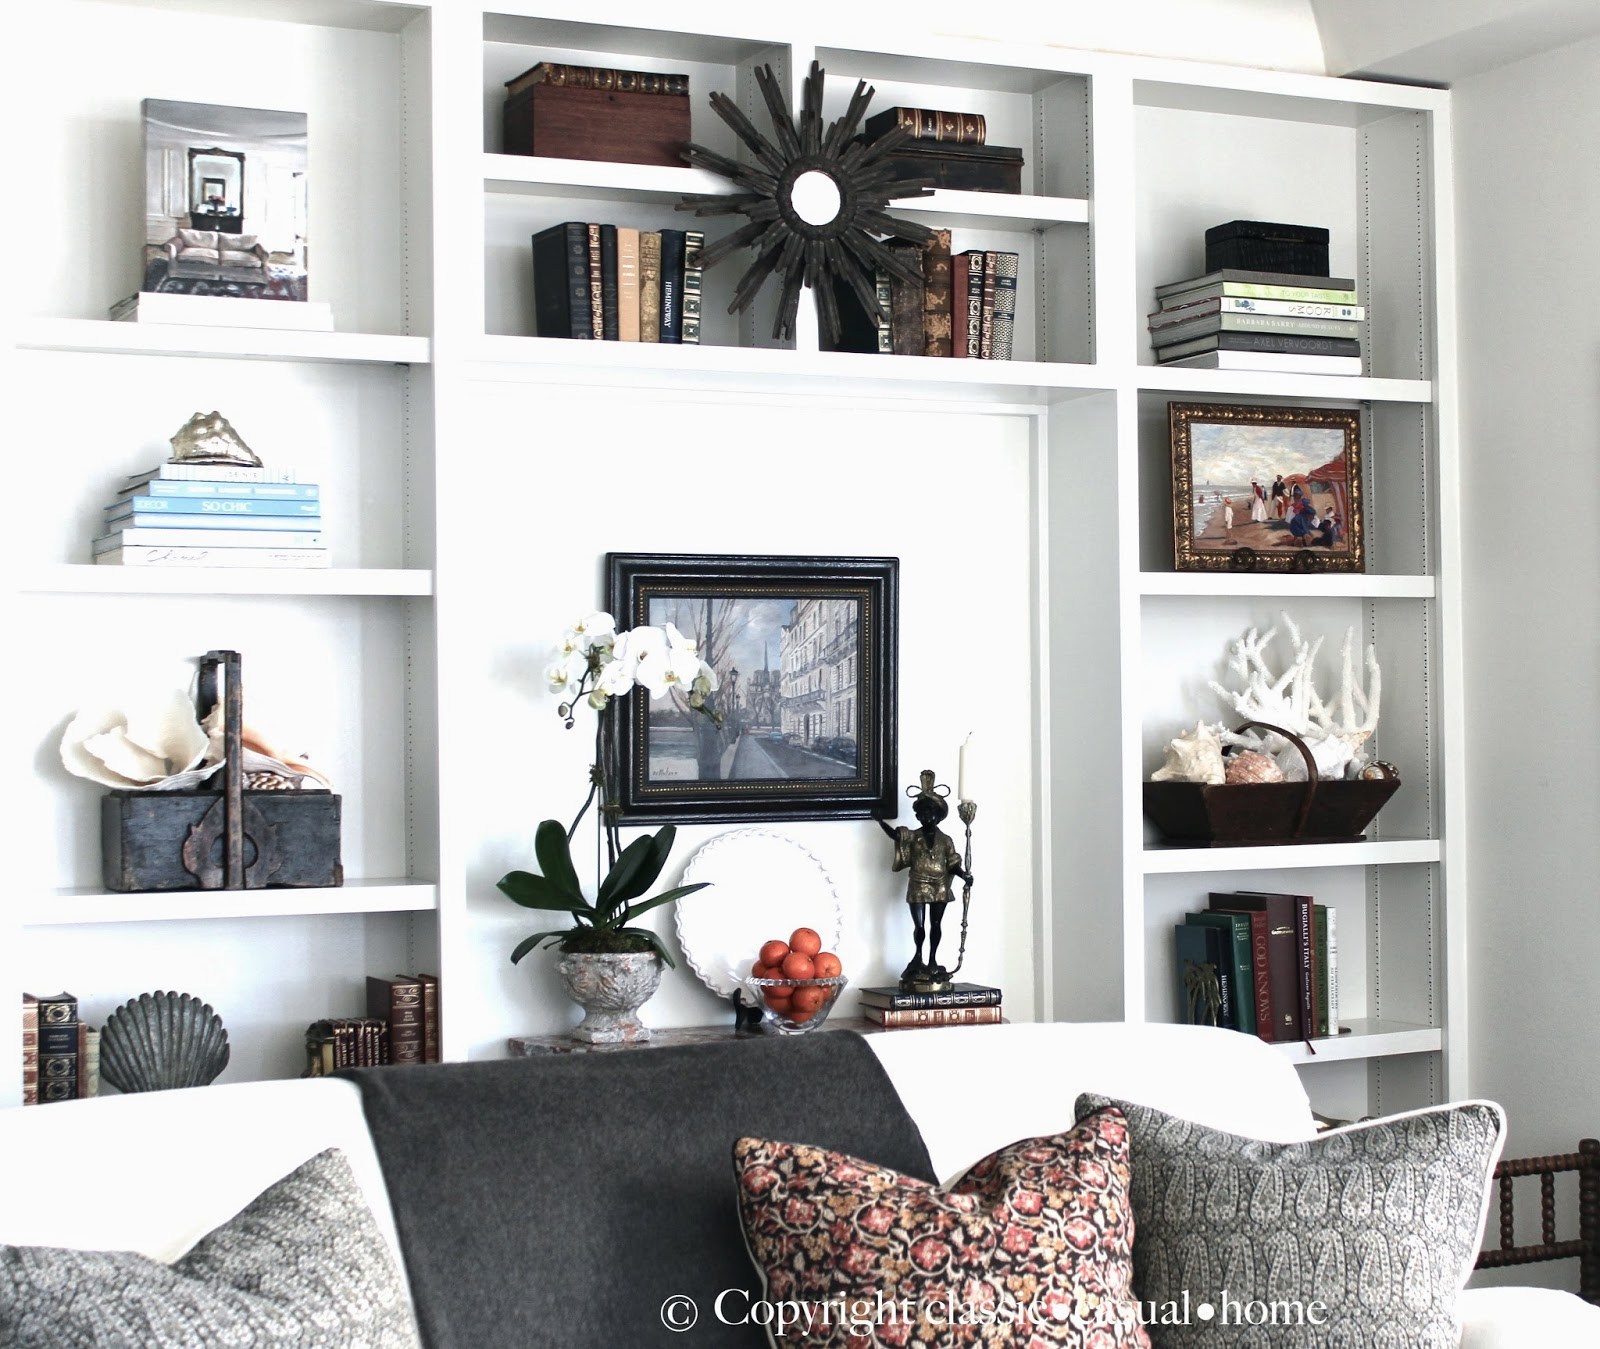 Our Living Room Shelves - Classic Casual Home